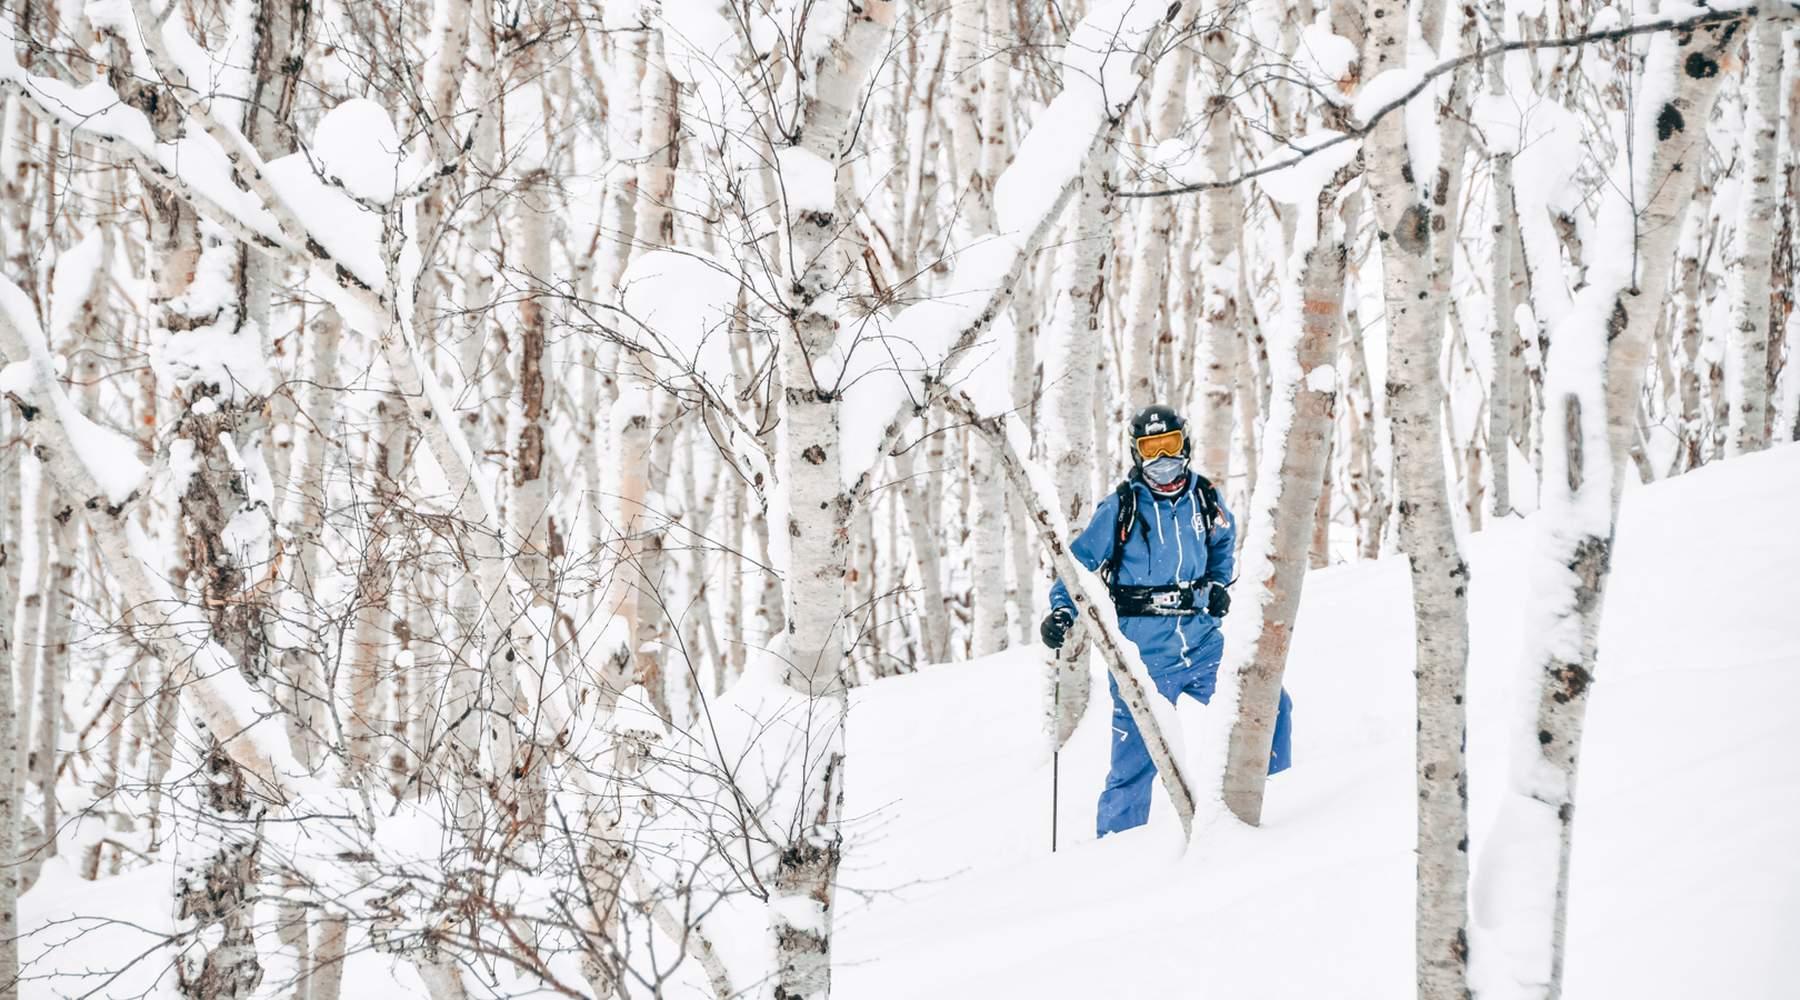 Japow - Powder Camp, Avalanche Briefing Sapporo, Hokkaido, Japan #aa4f1c1c-9777-49b3-aca6-e34f4b07988e